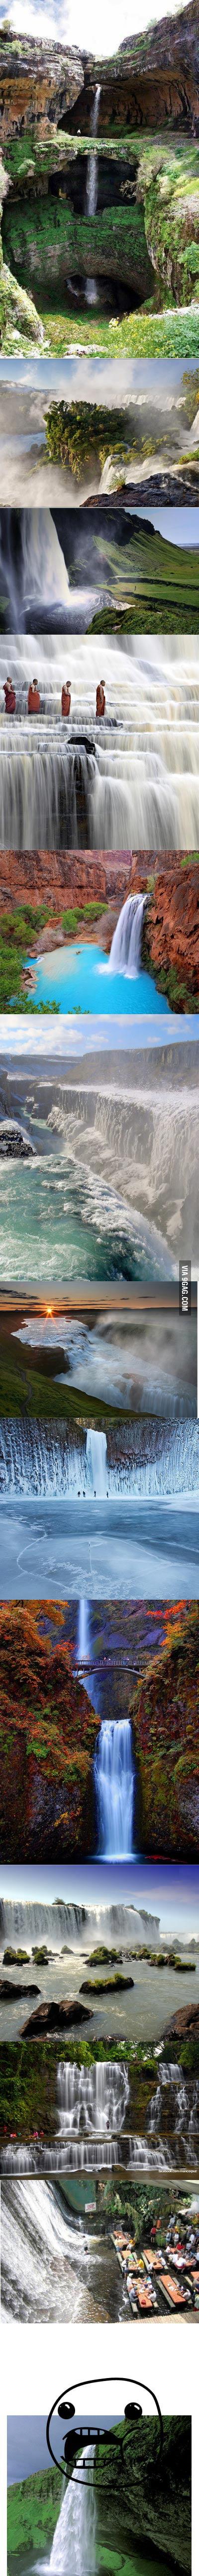 So you like waterfalls?